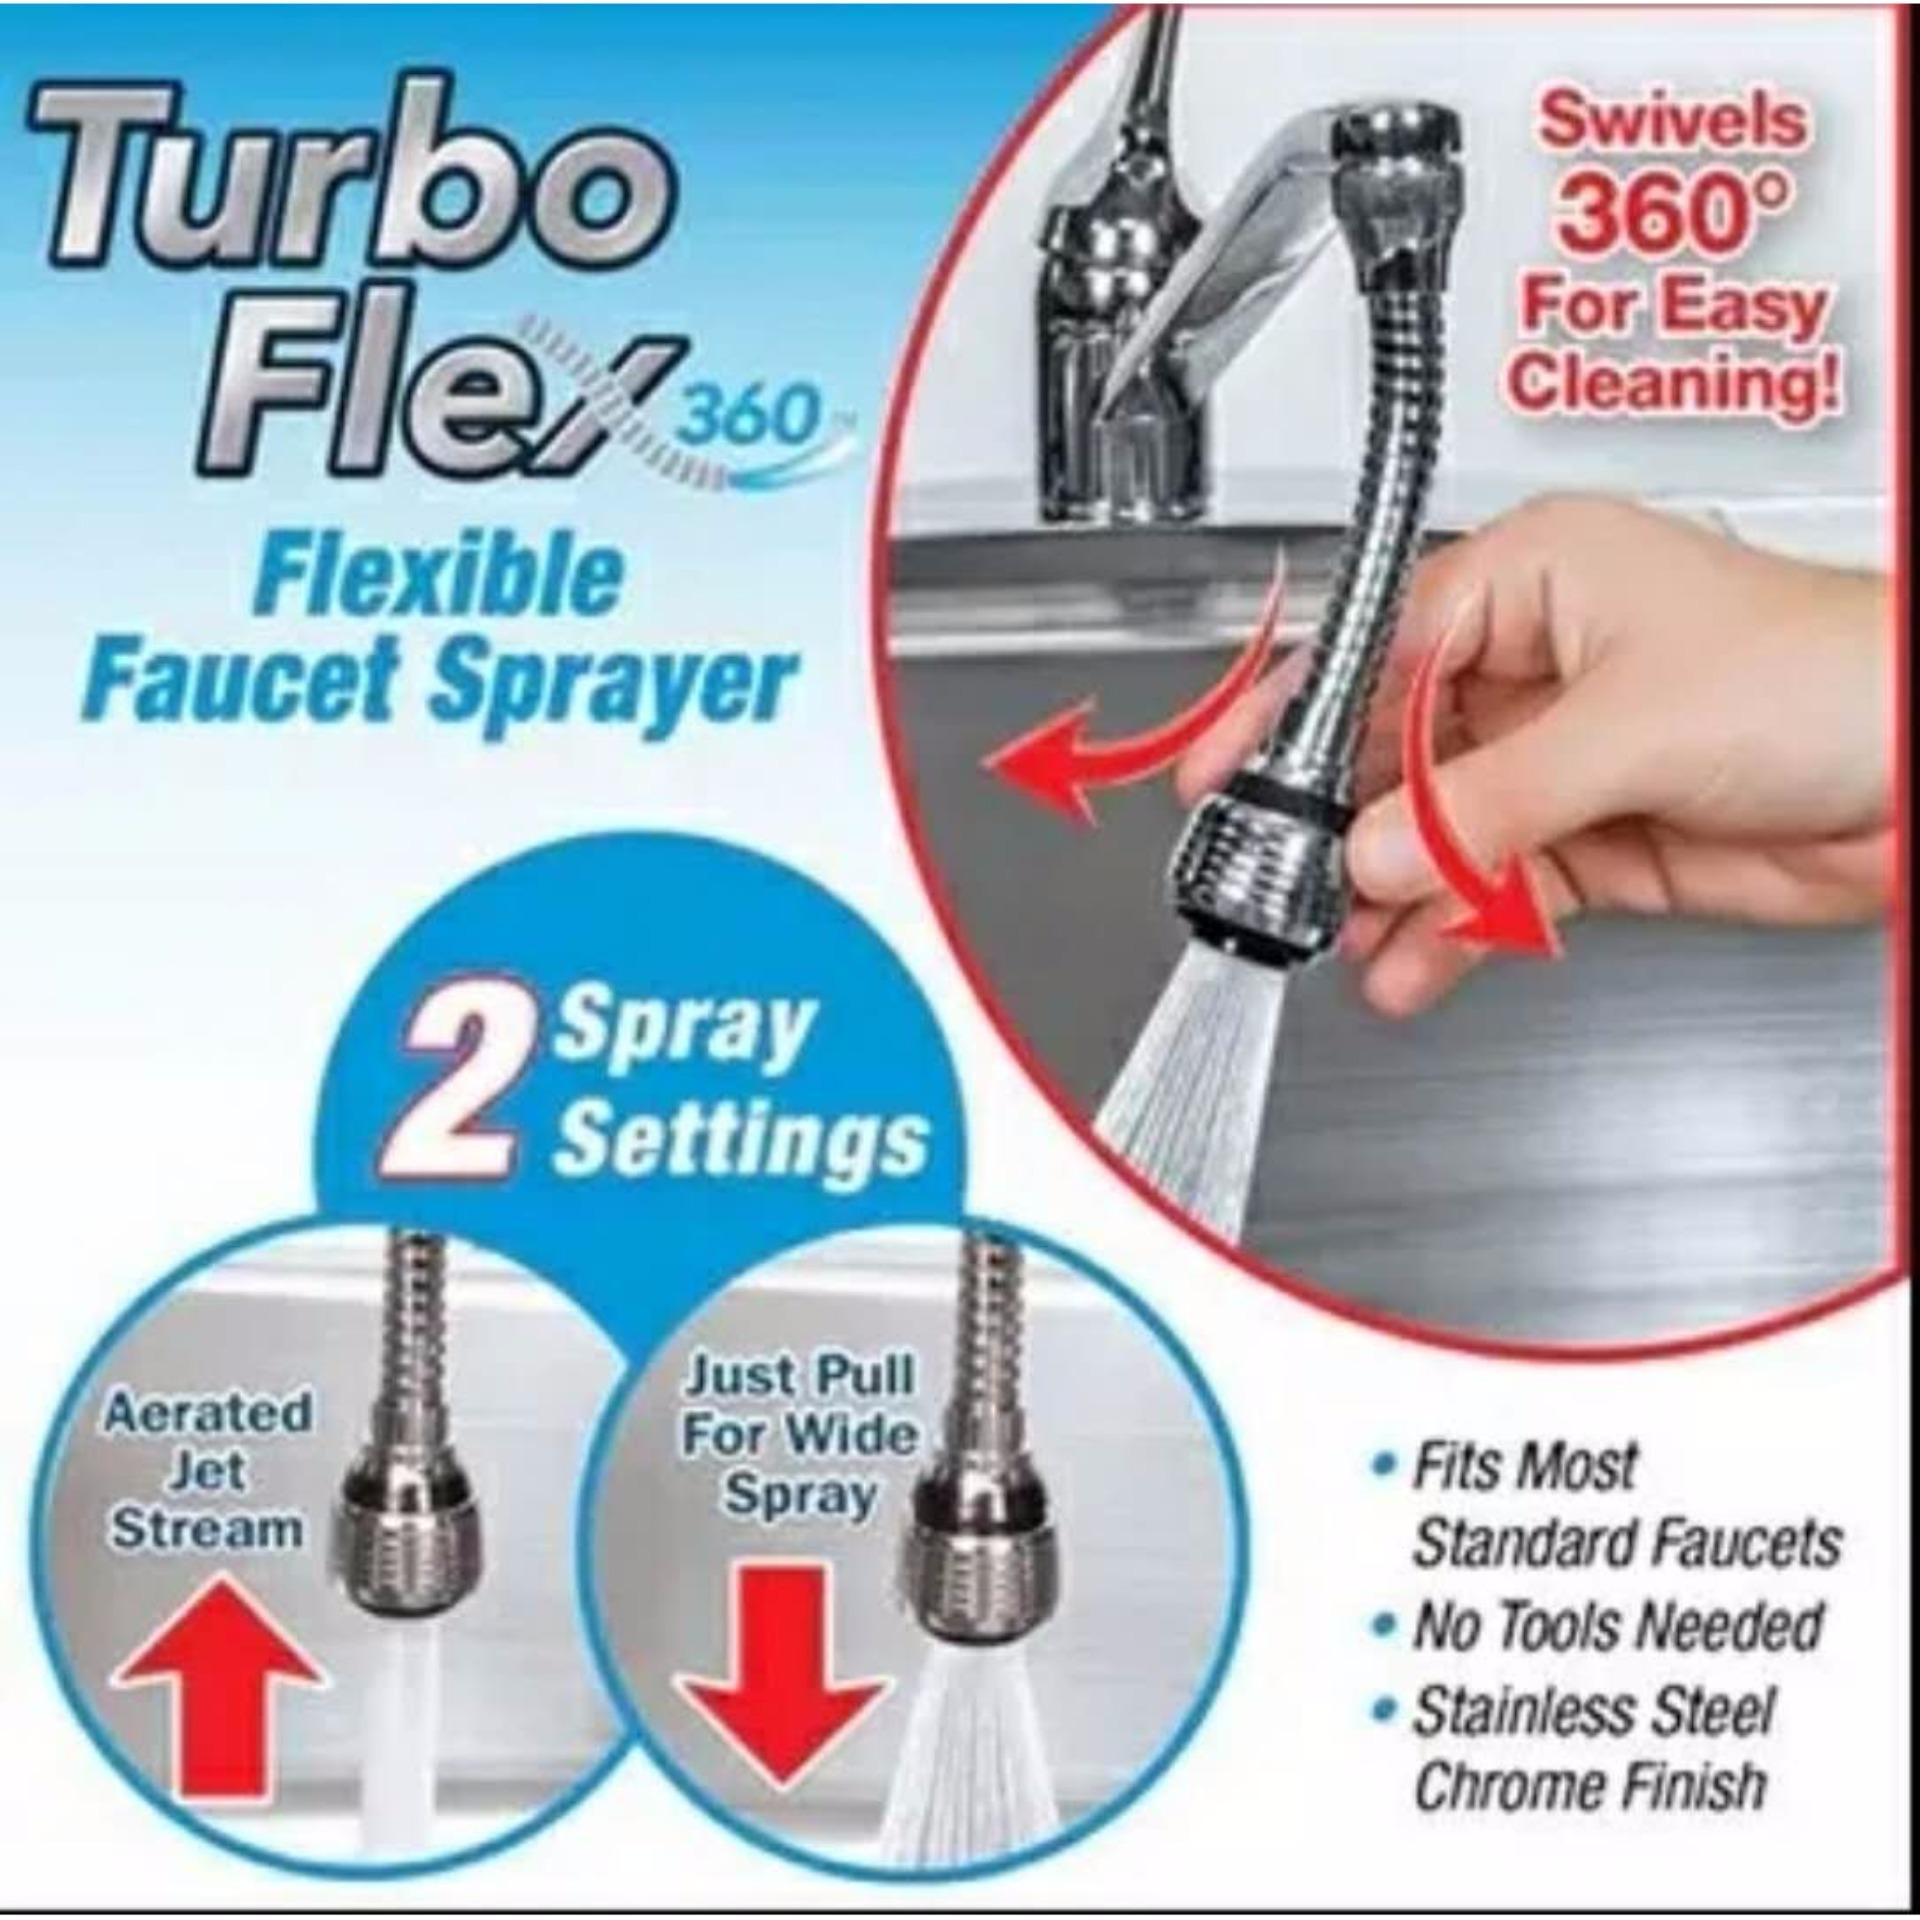 ☆COD TV 6Turbo Flex 360°Flexible Faucet Sprayer Swivels 360° For ...